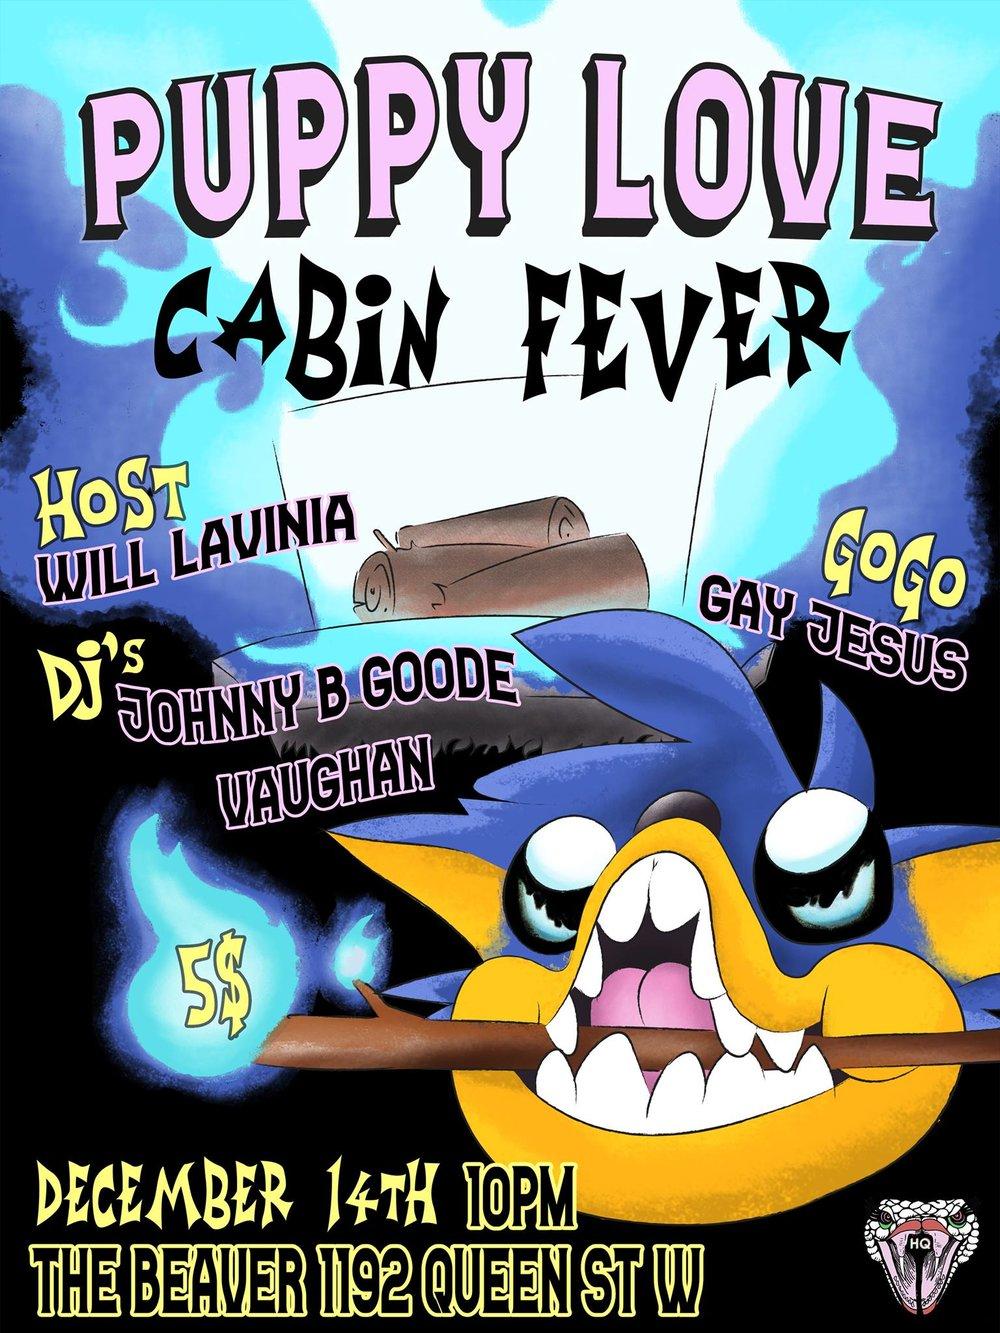 Puppy-love-cabin-fever